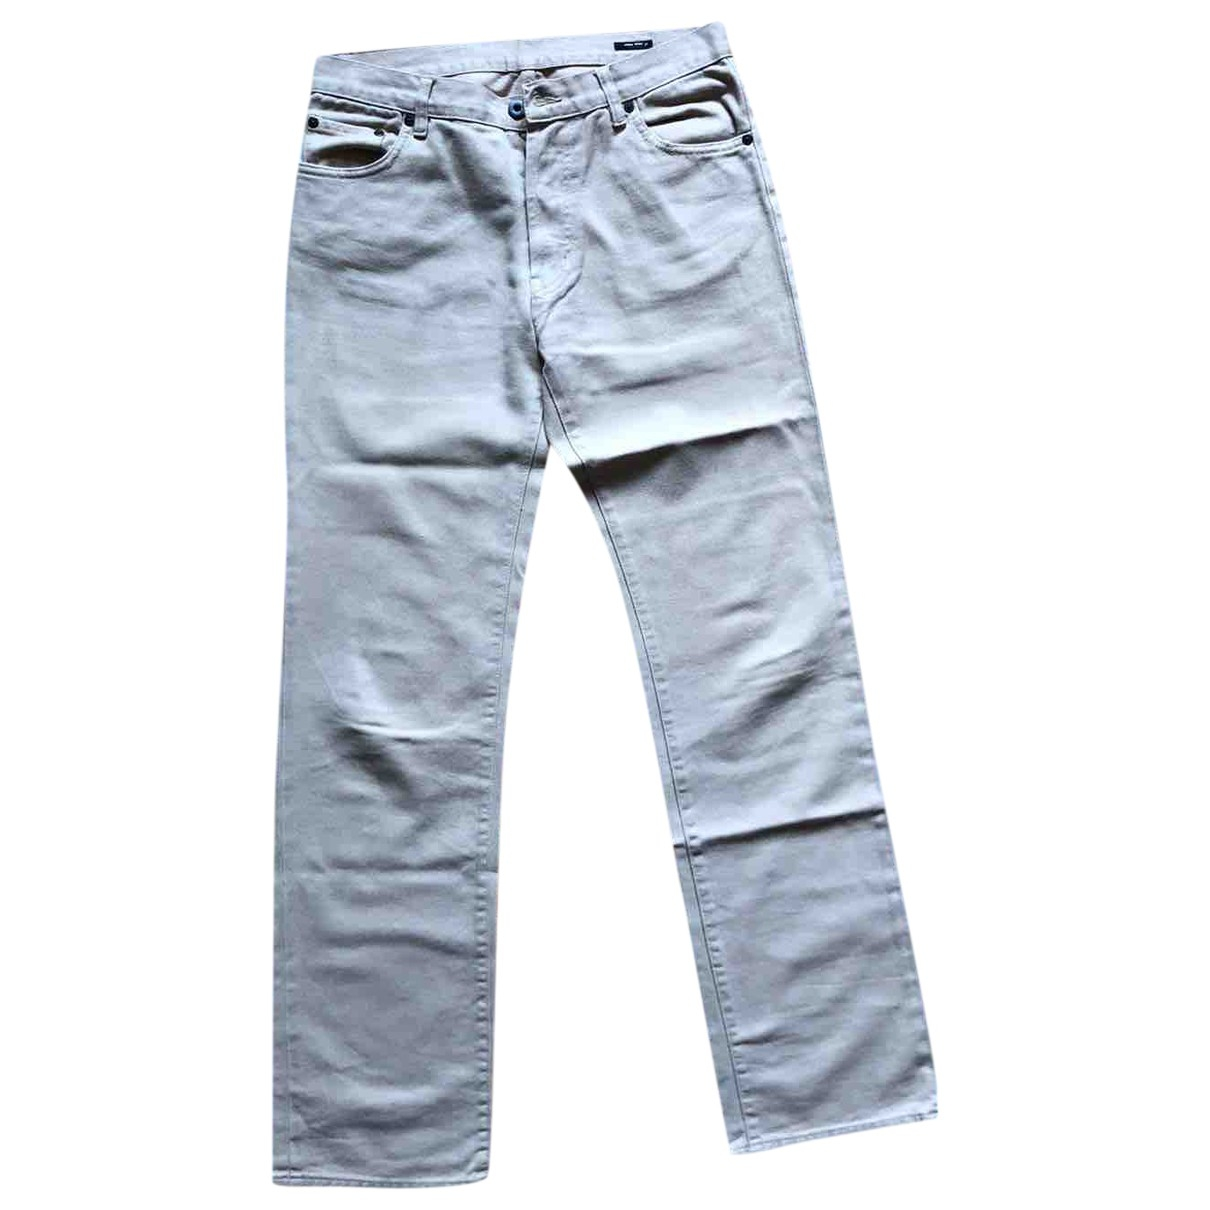 Miu Miu \N Beige Denim - Jeans Trousers for Men M International